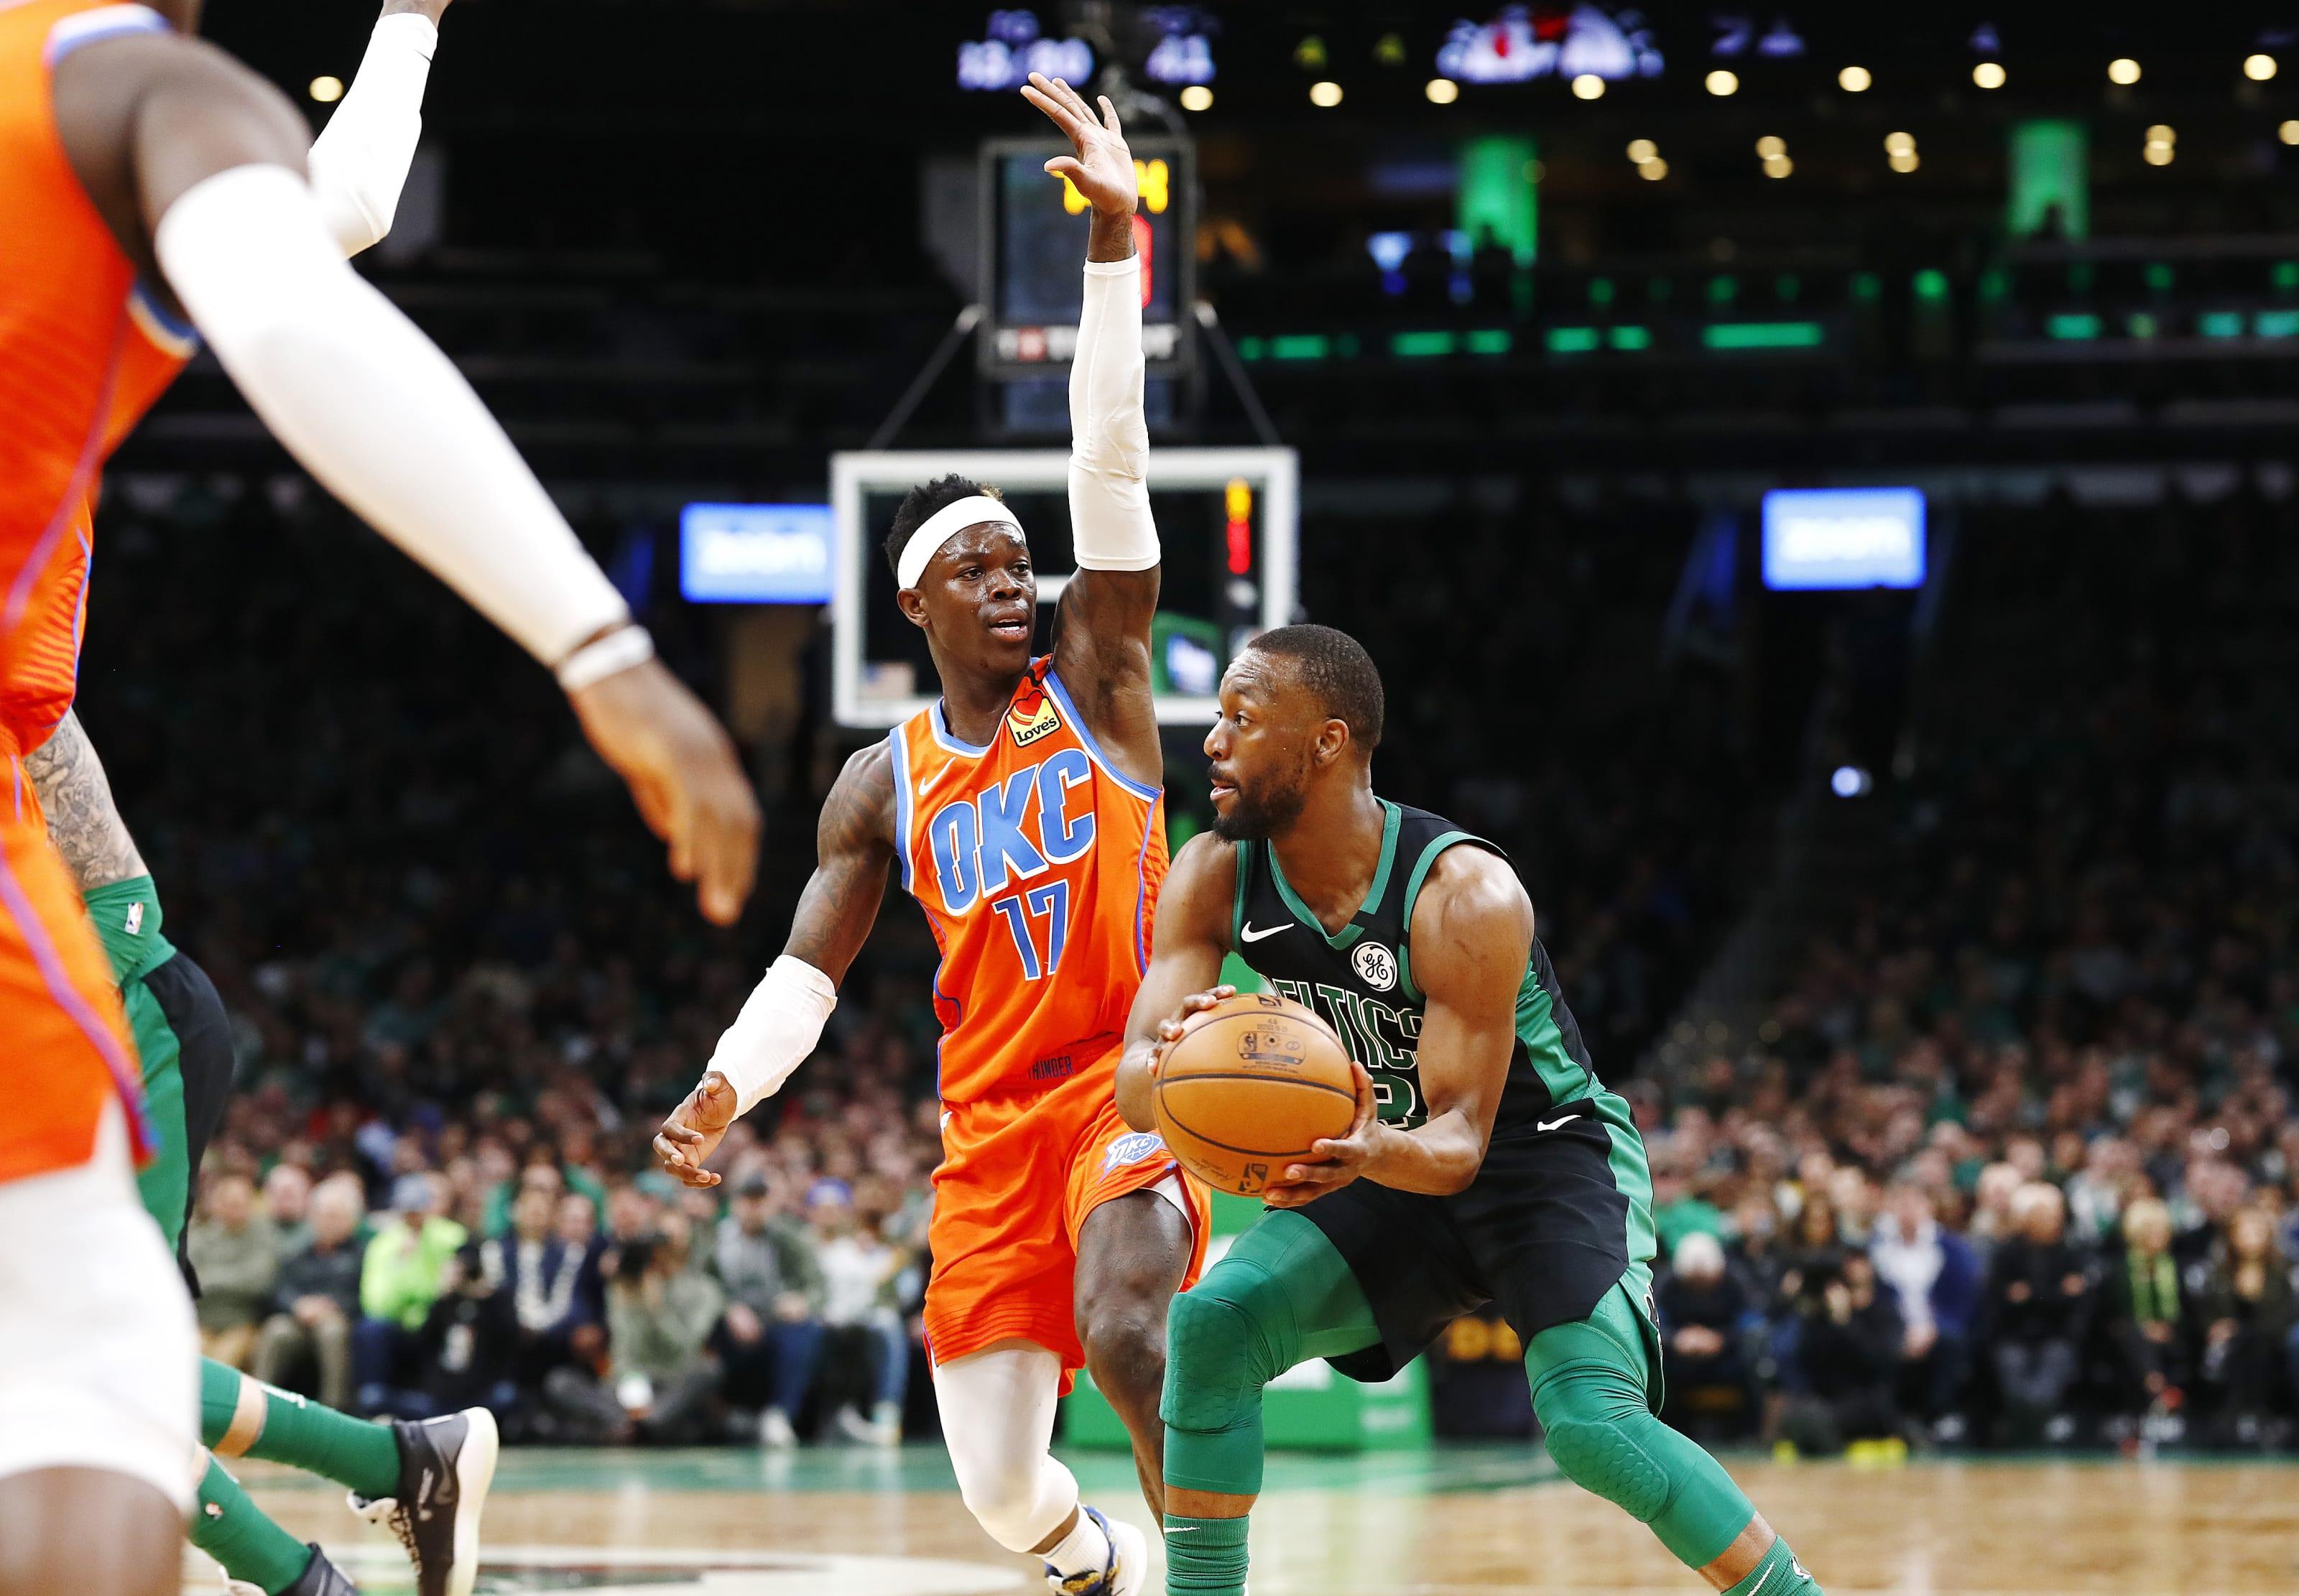 OKC Thunder: Dennis Schroder, Boston Celtics: Kemba Walker